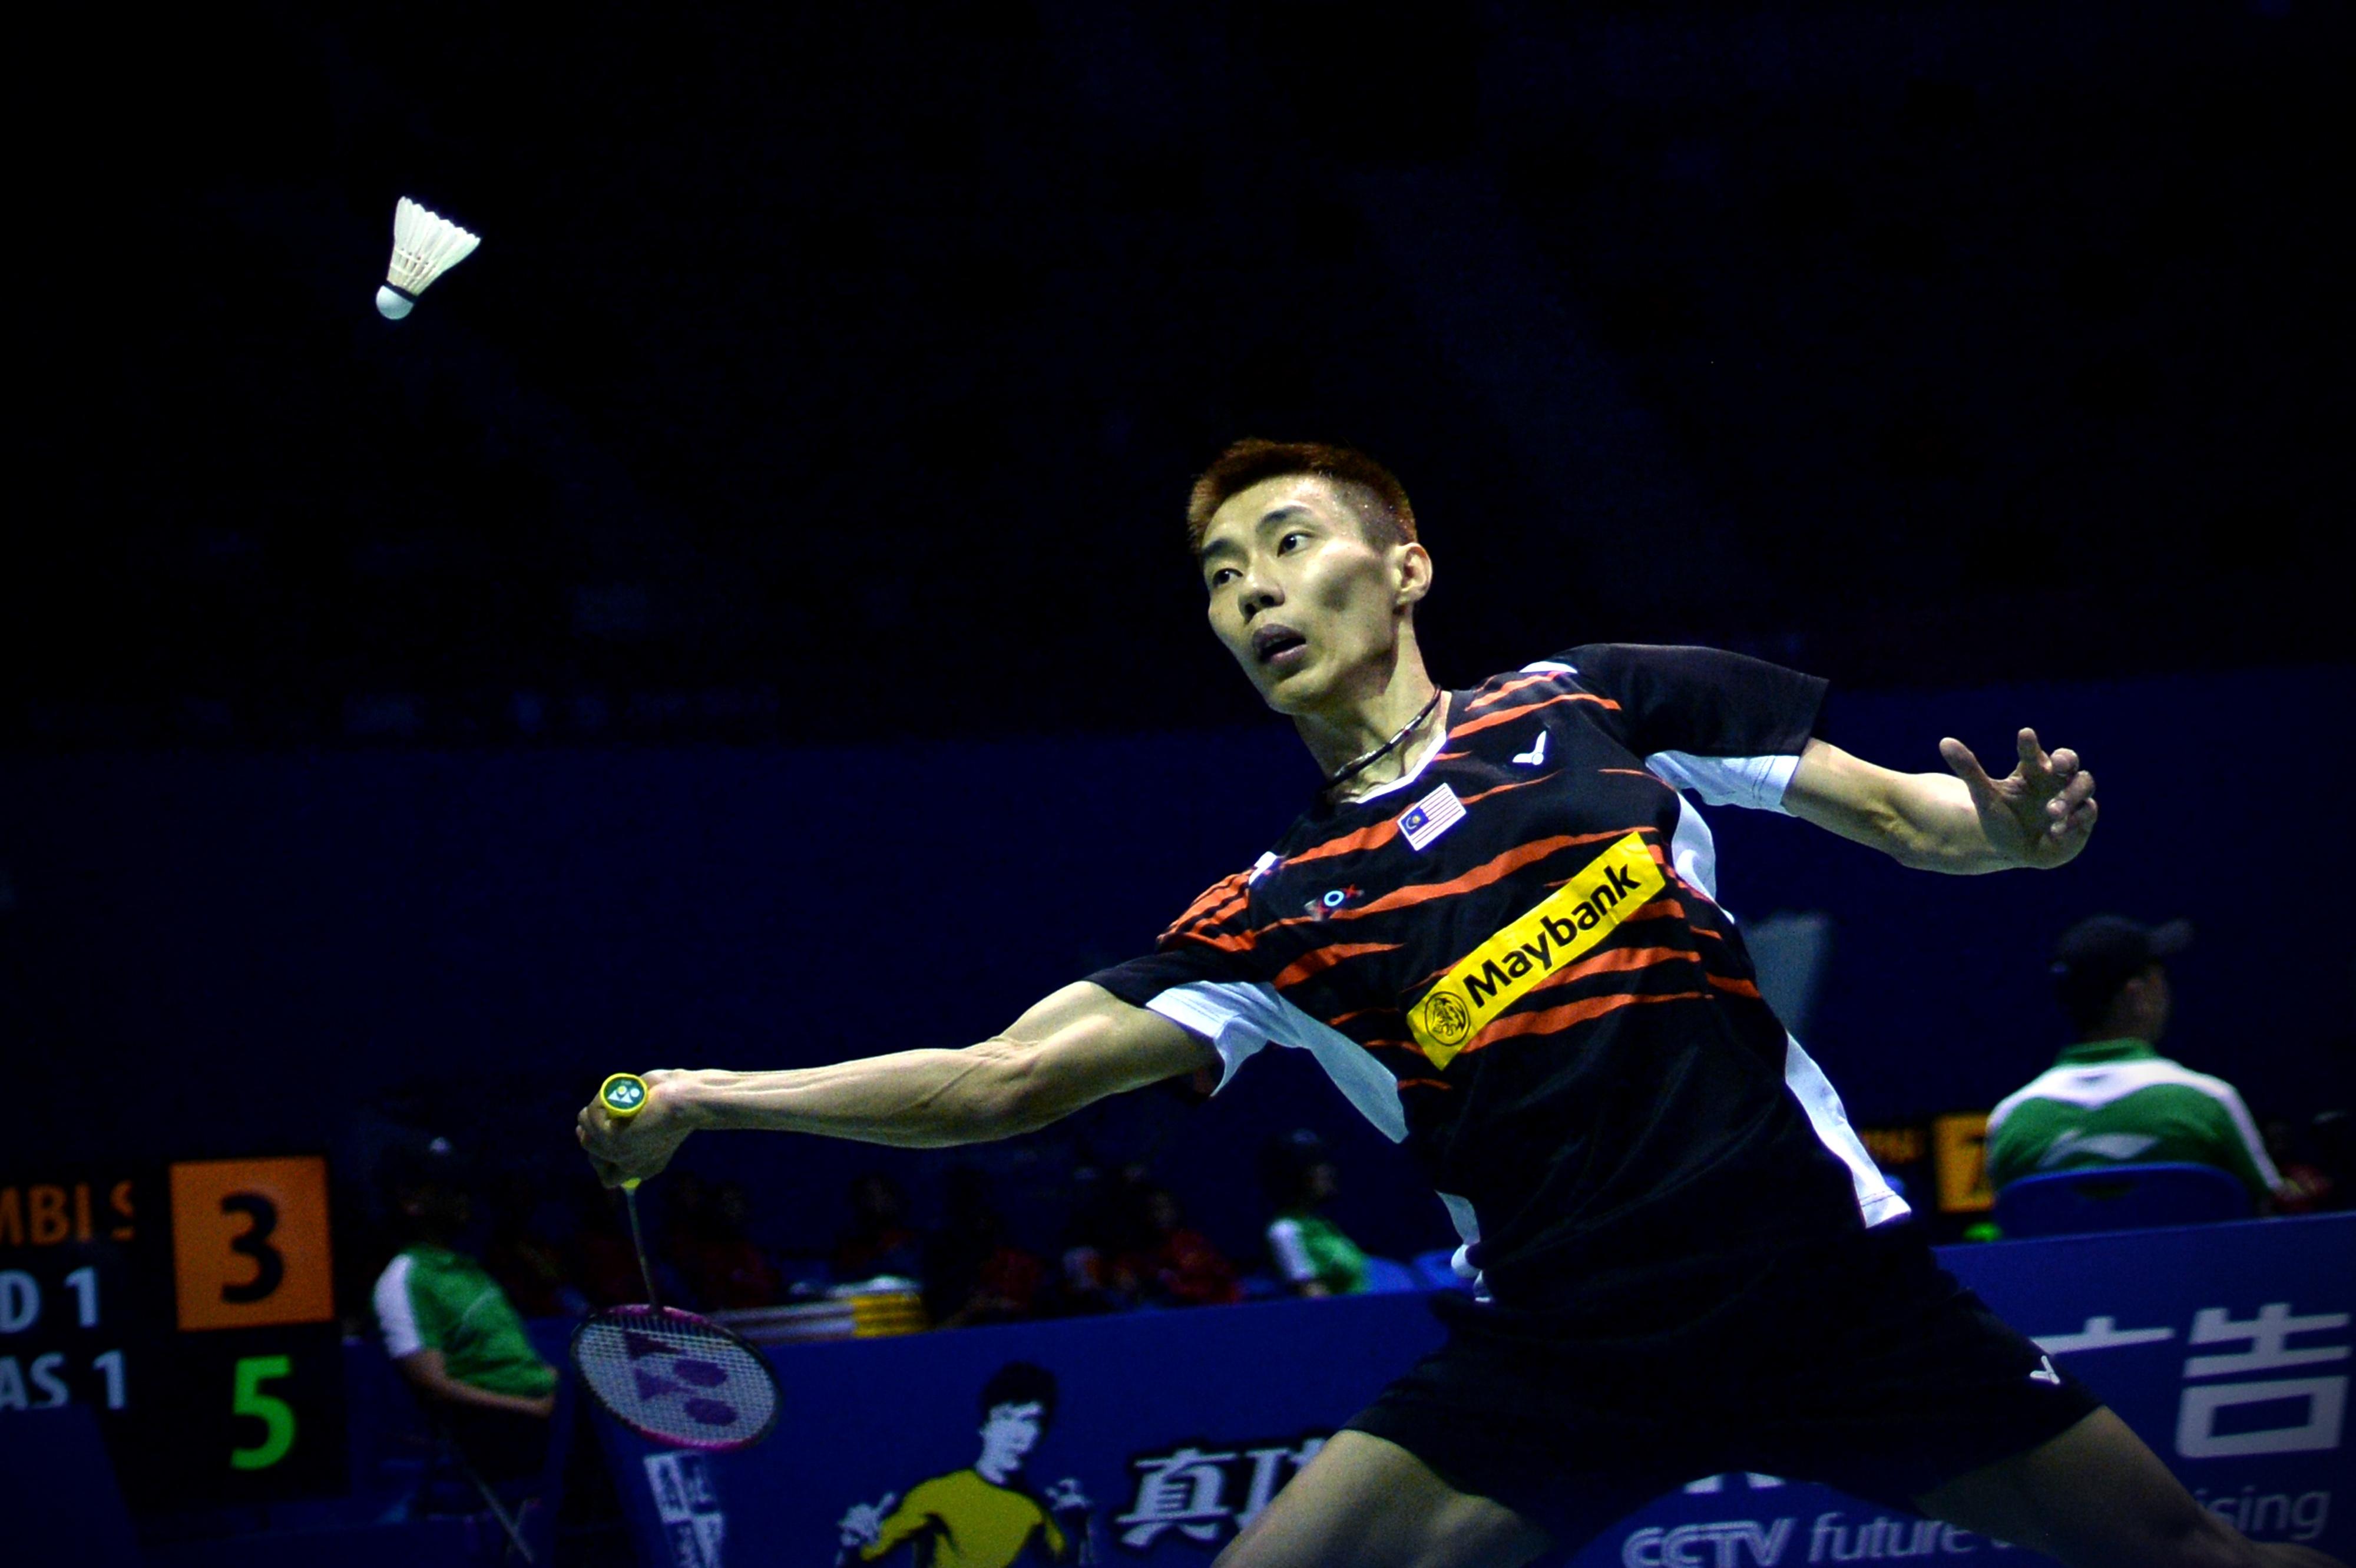 lee_chong_wei-sudirman_cup_badminton-120515-afp